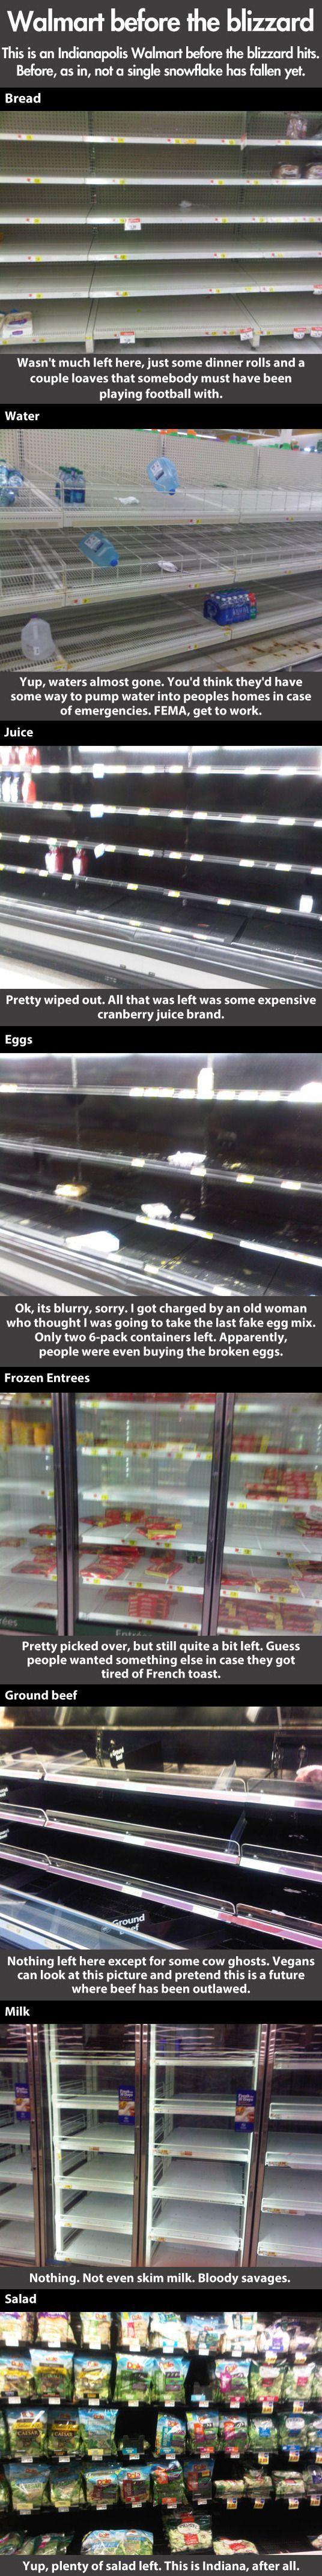 What the polar vortex caused, lol!!!